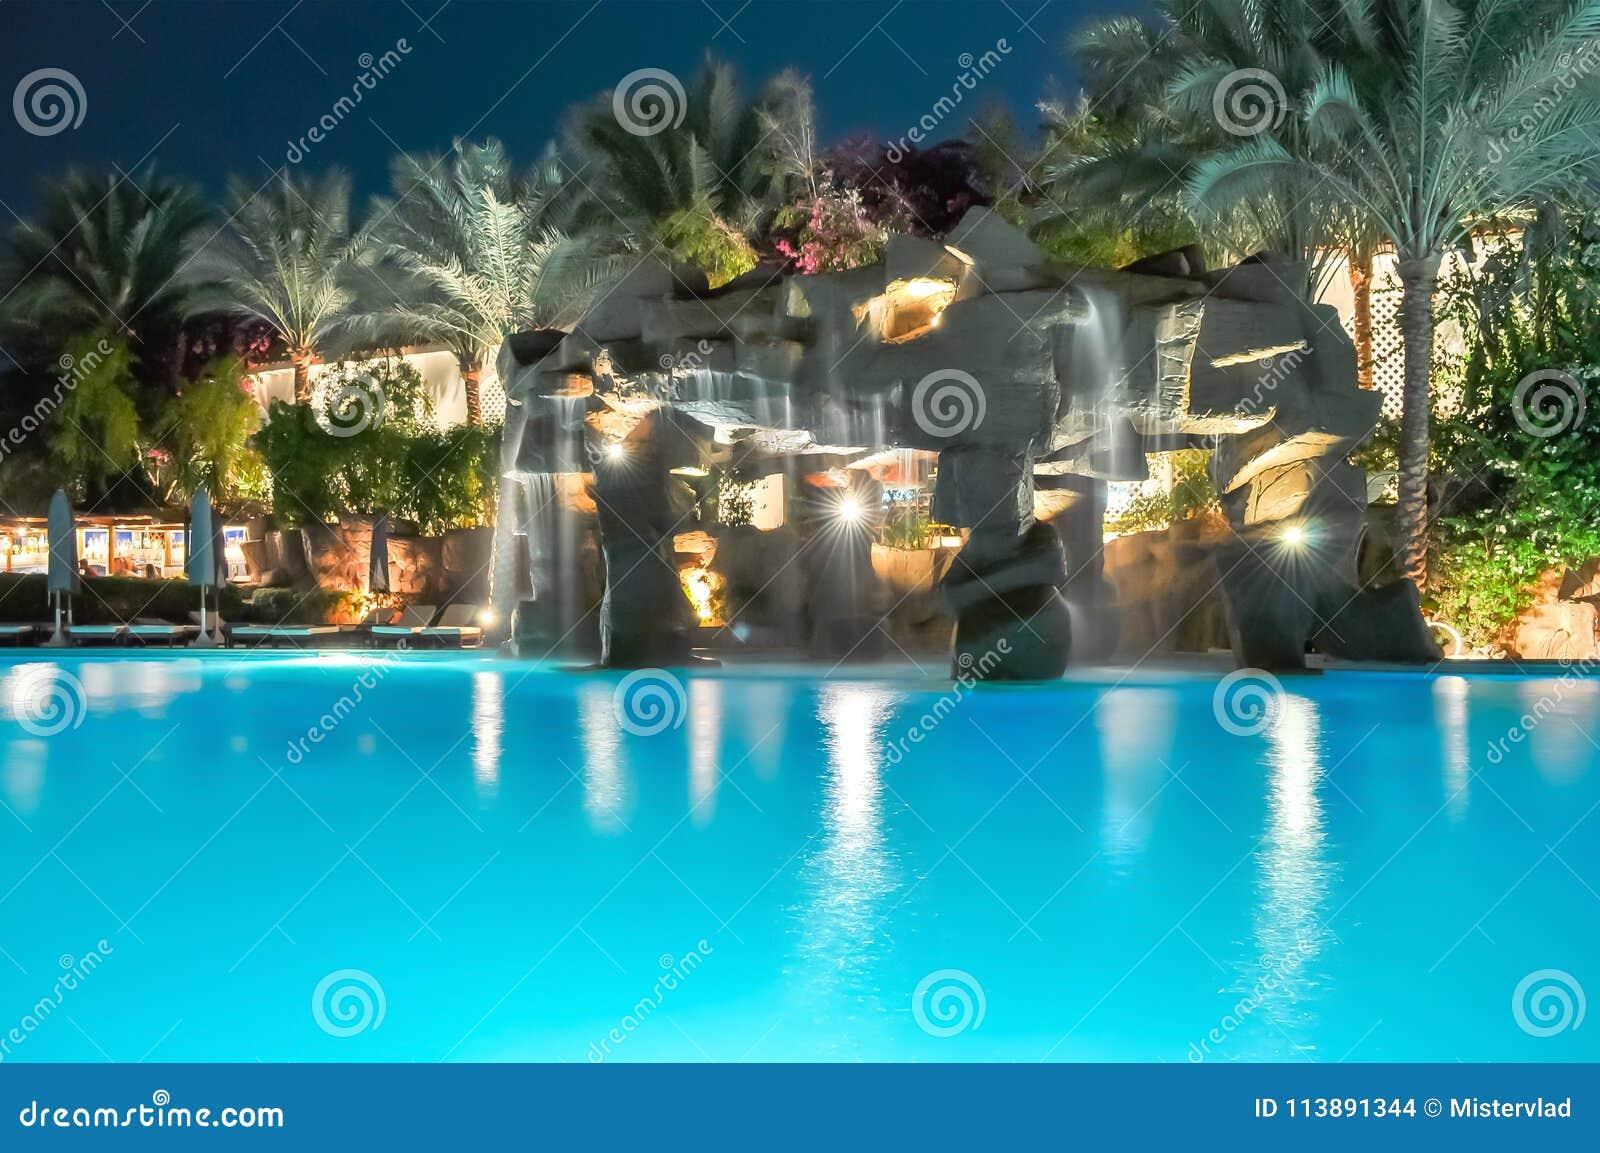 Overview of swimming pools on Vasilyevsky Island in St. Petersburg 39